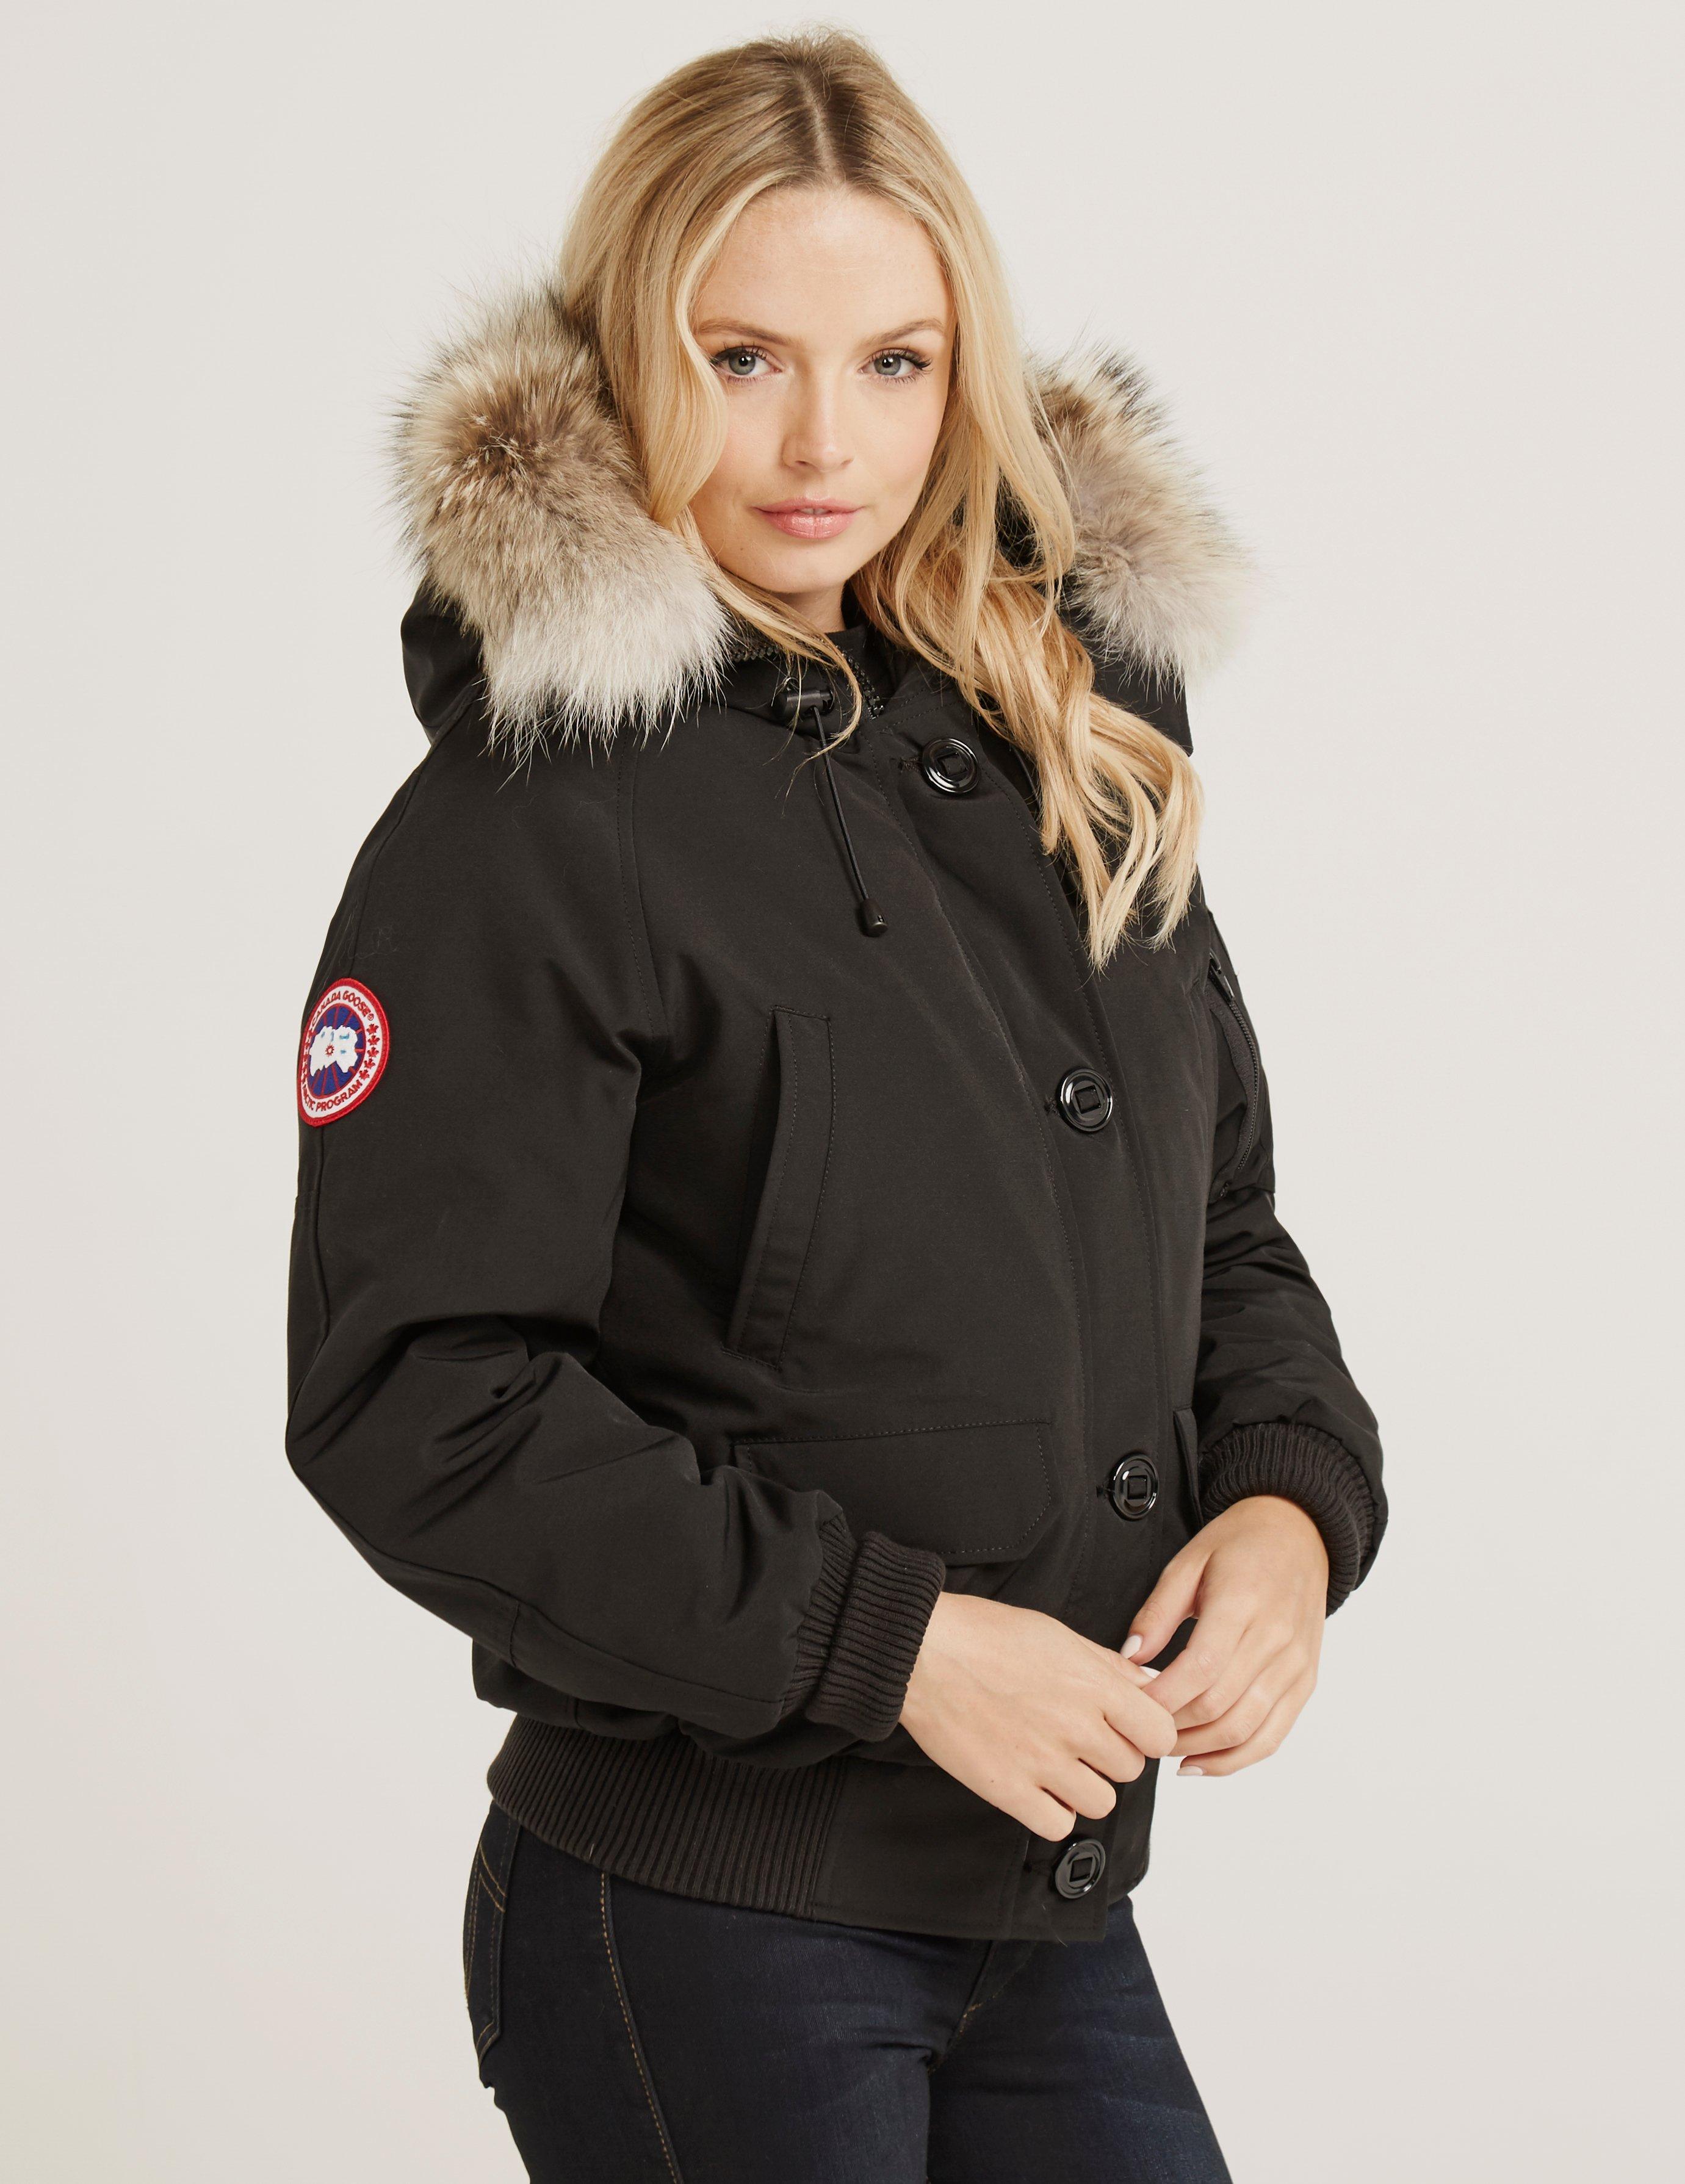 26e2ea60fd4 Canada Goose Womens Chilliwack Padded Bomber Jacket Black in Black ...